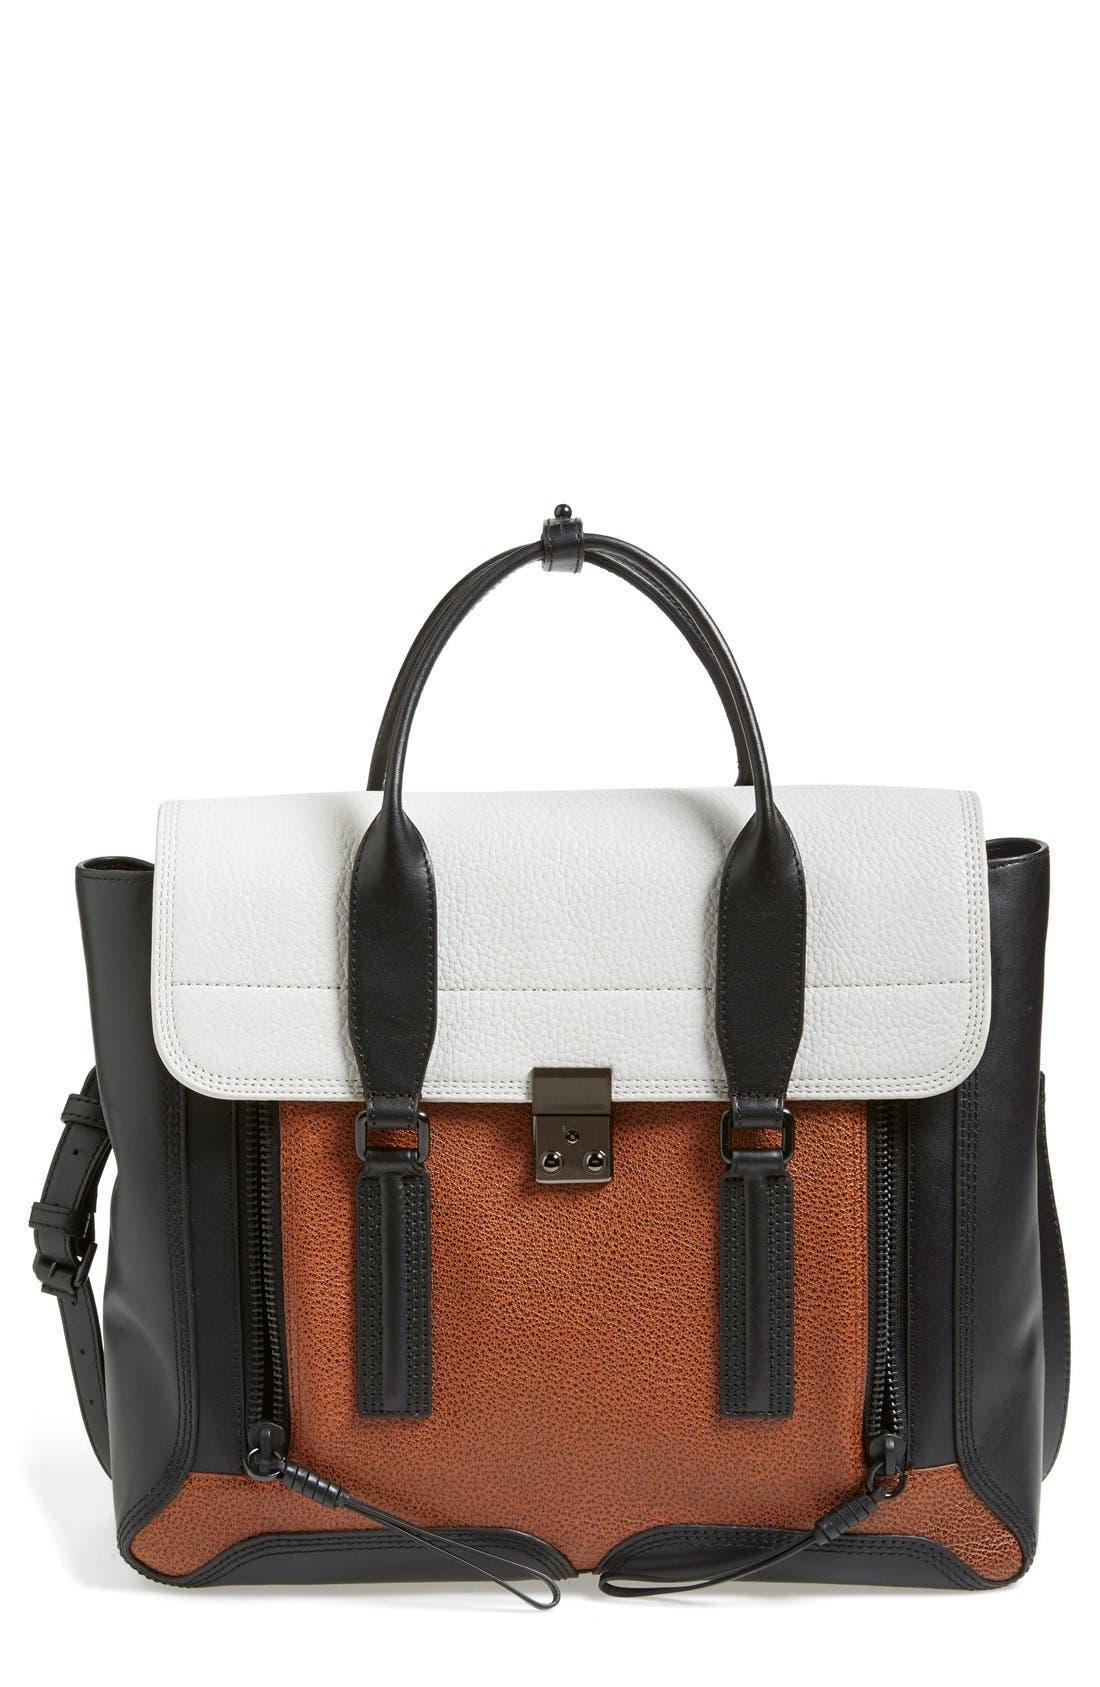 Alternate Image 1 Selected - 3.1 Phillip Lim 'Large Pashli' Leather Satchel